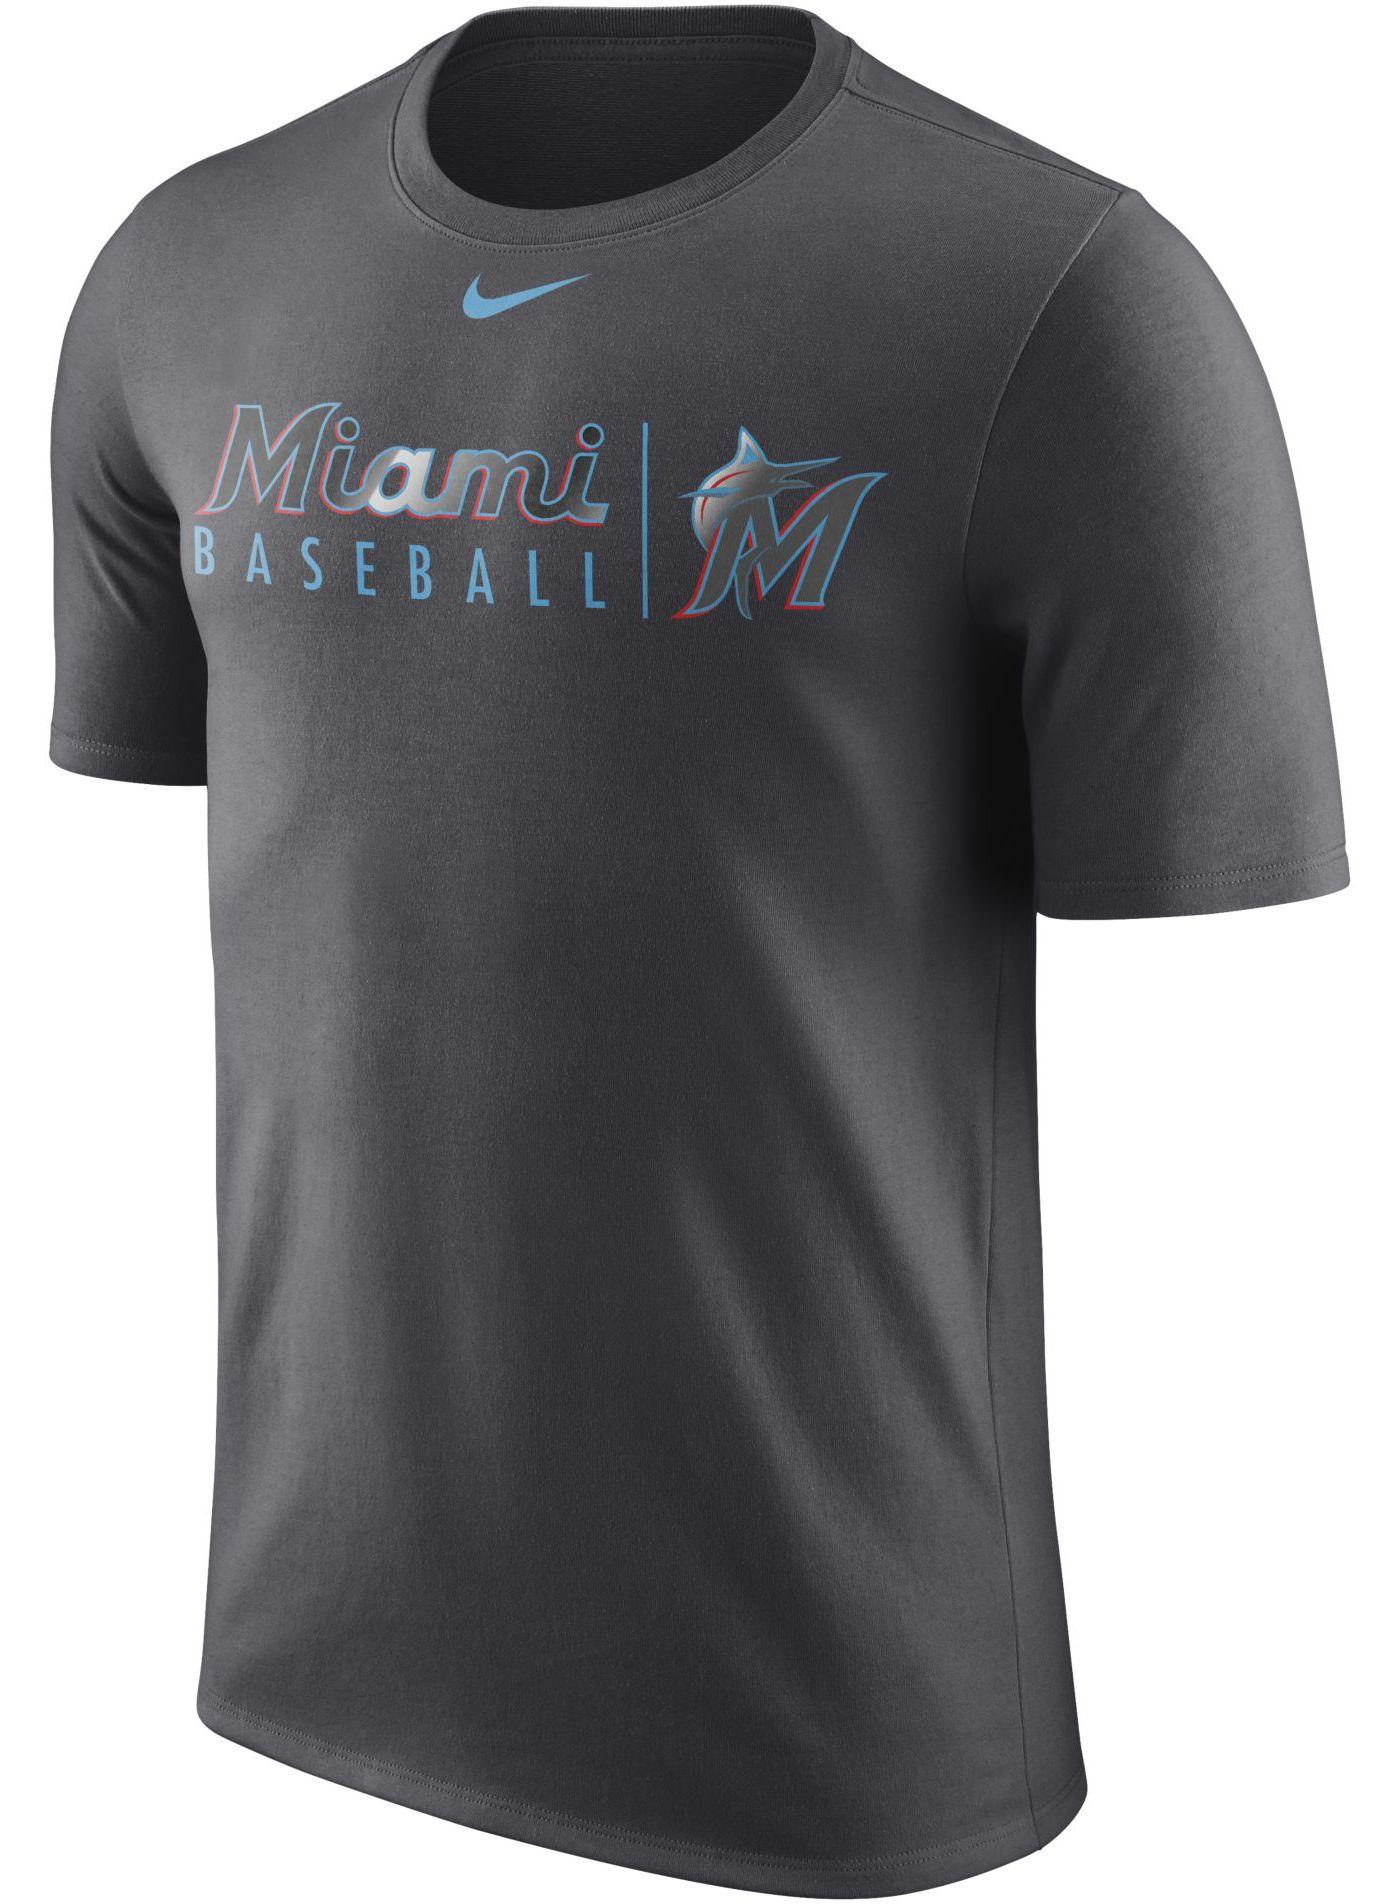 Nike Men's Miami Marlins Practice T-Shirt